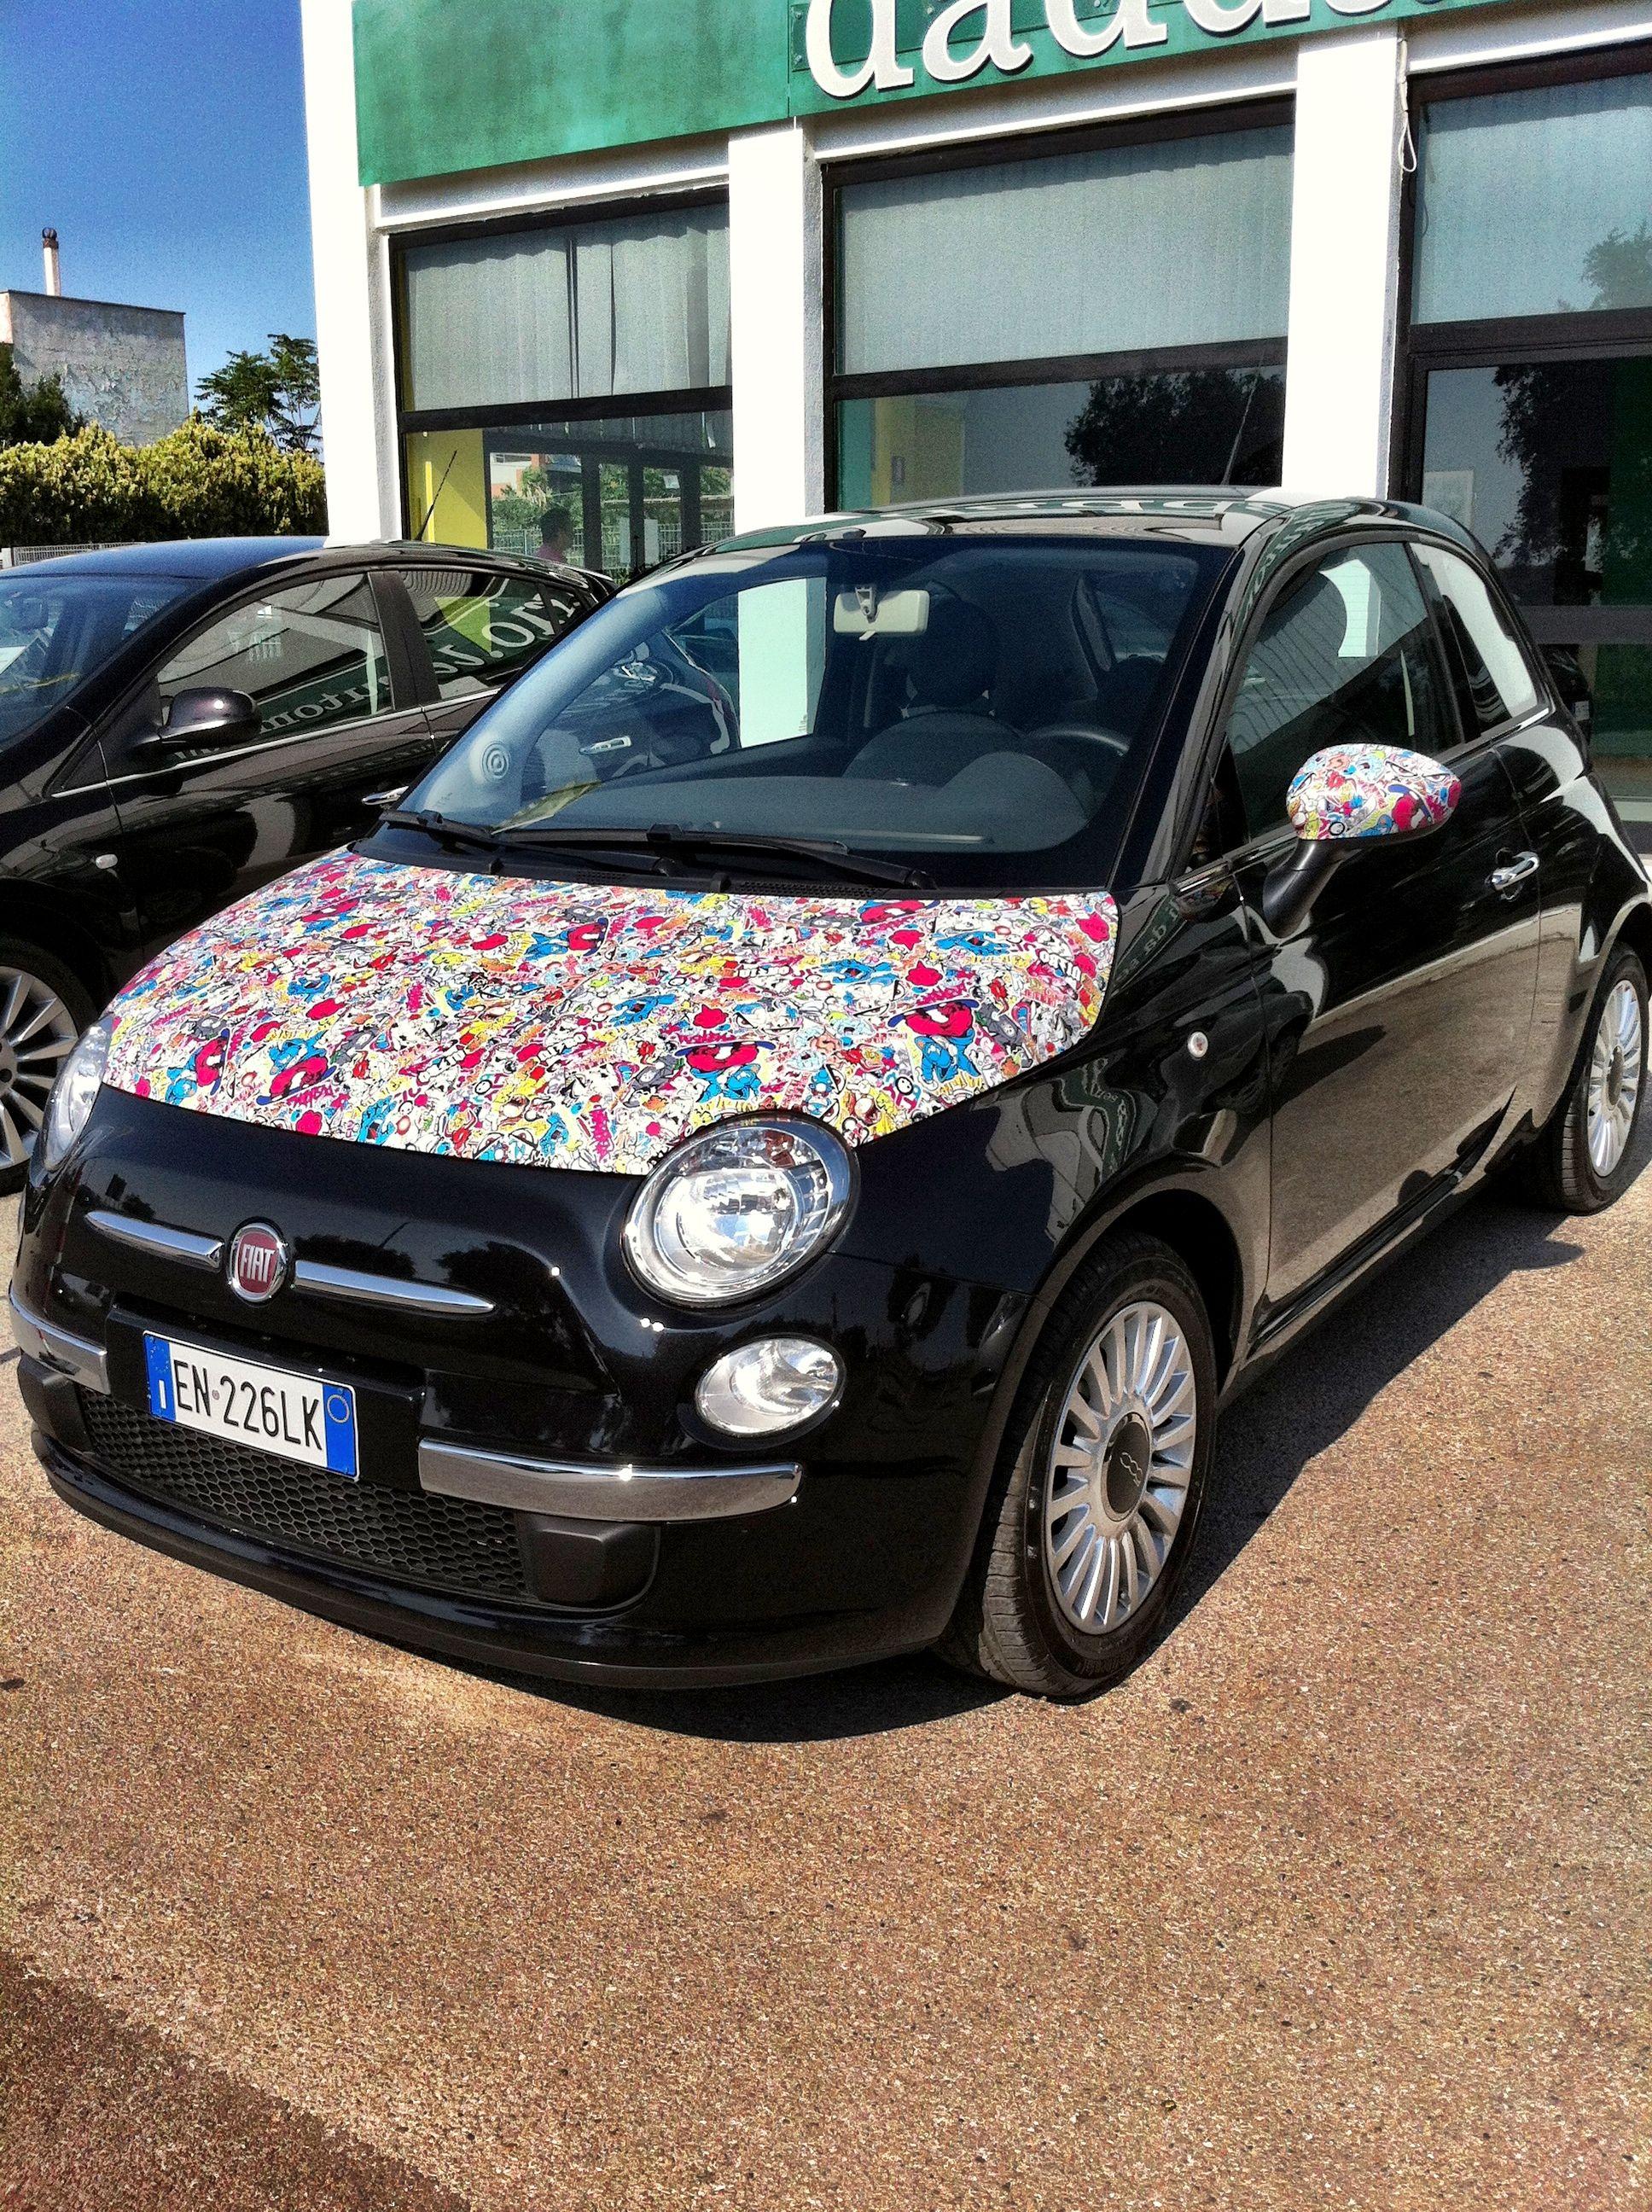 Sticker bomb car design - Sticker Bomb Car Wrap Fiat 500